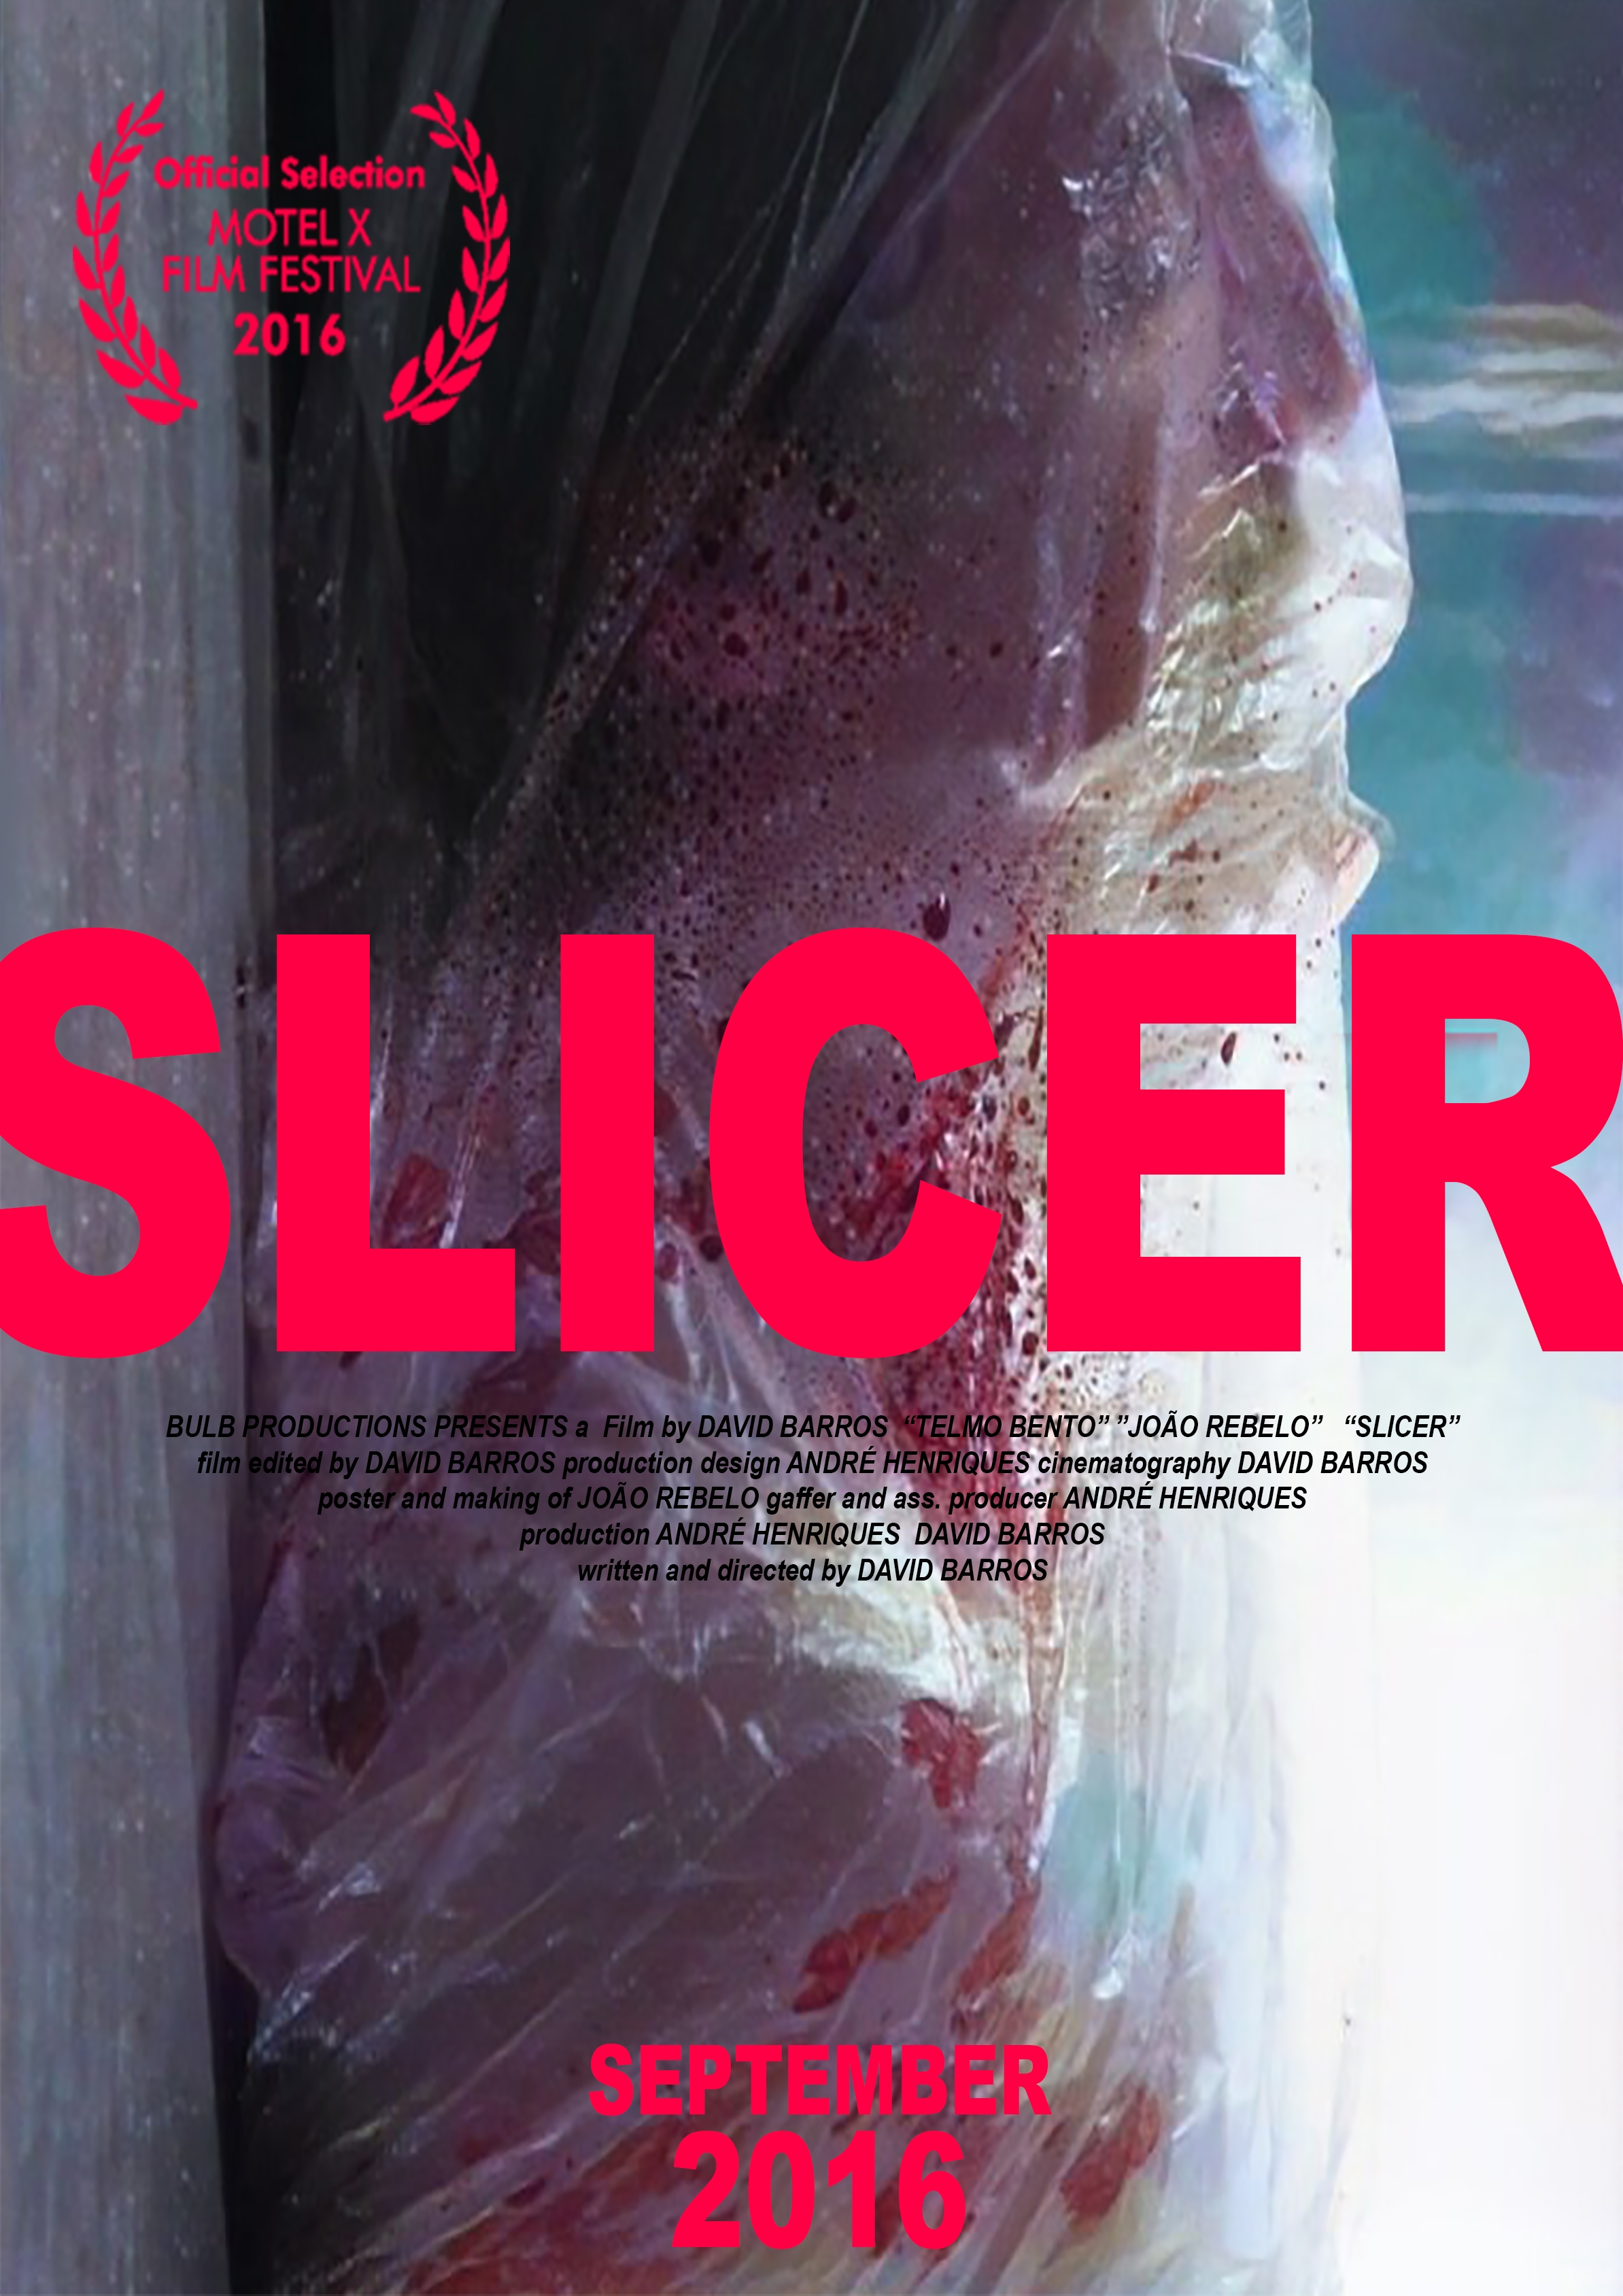 Slicer Short Film